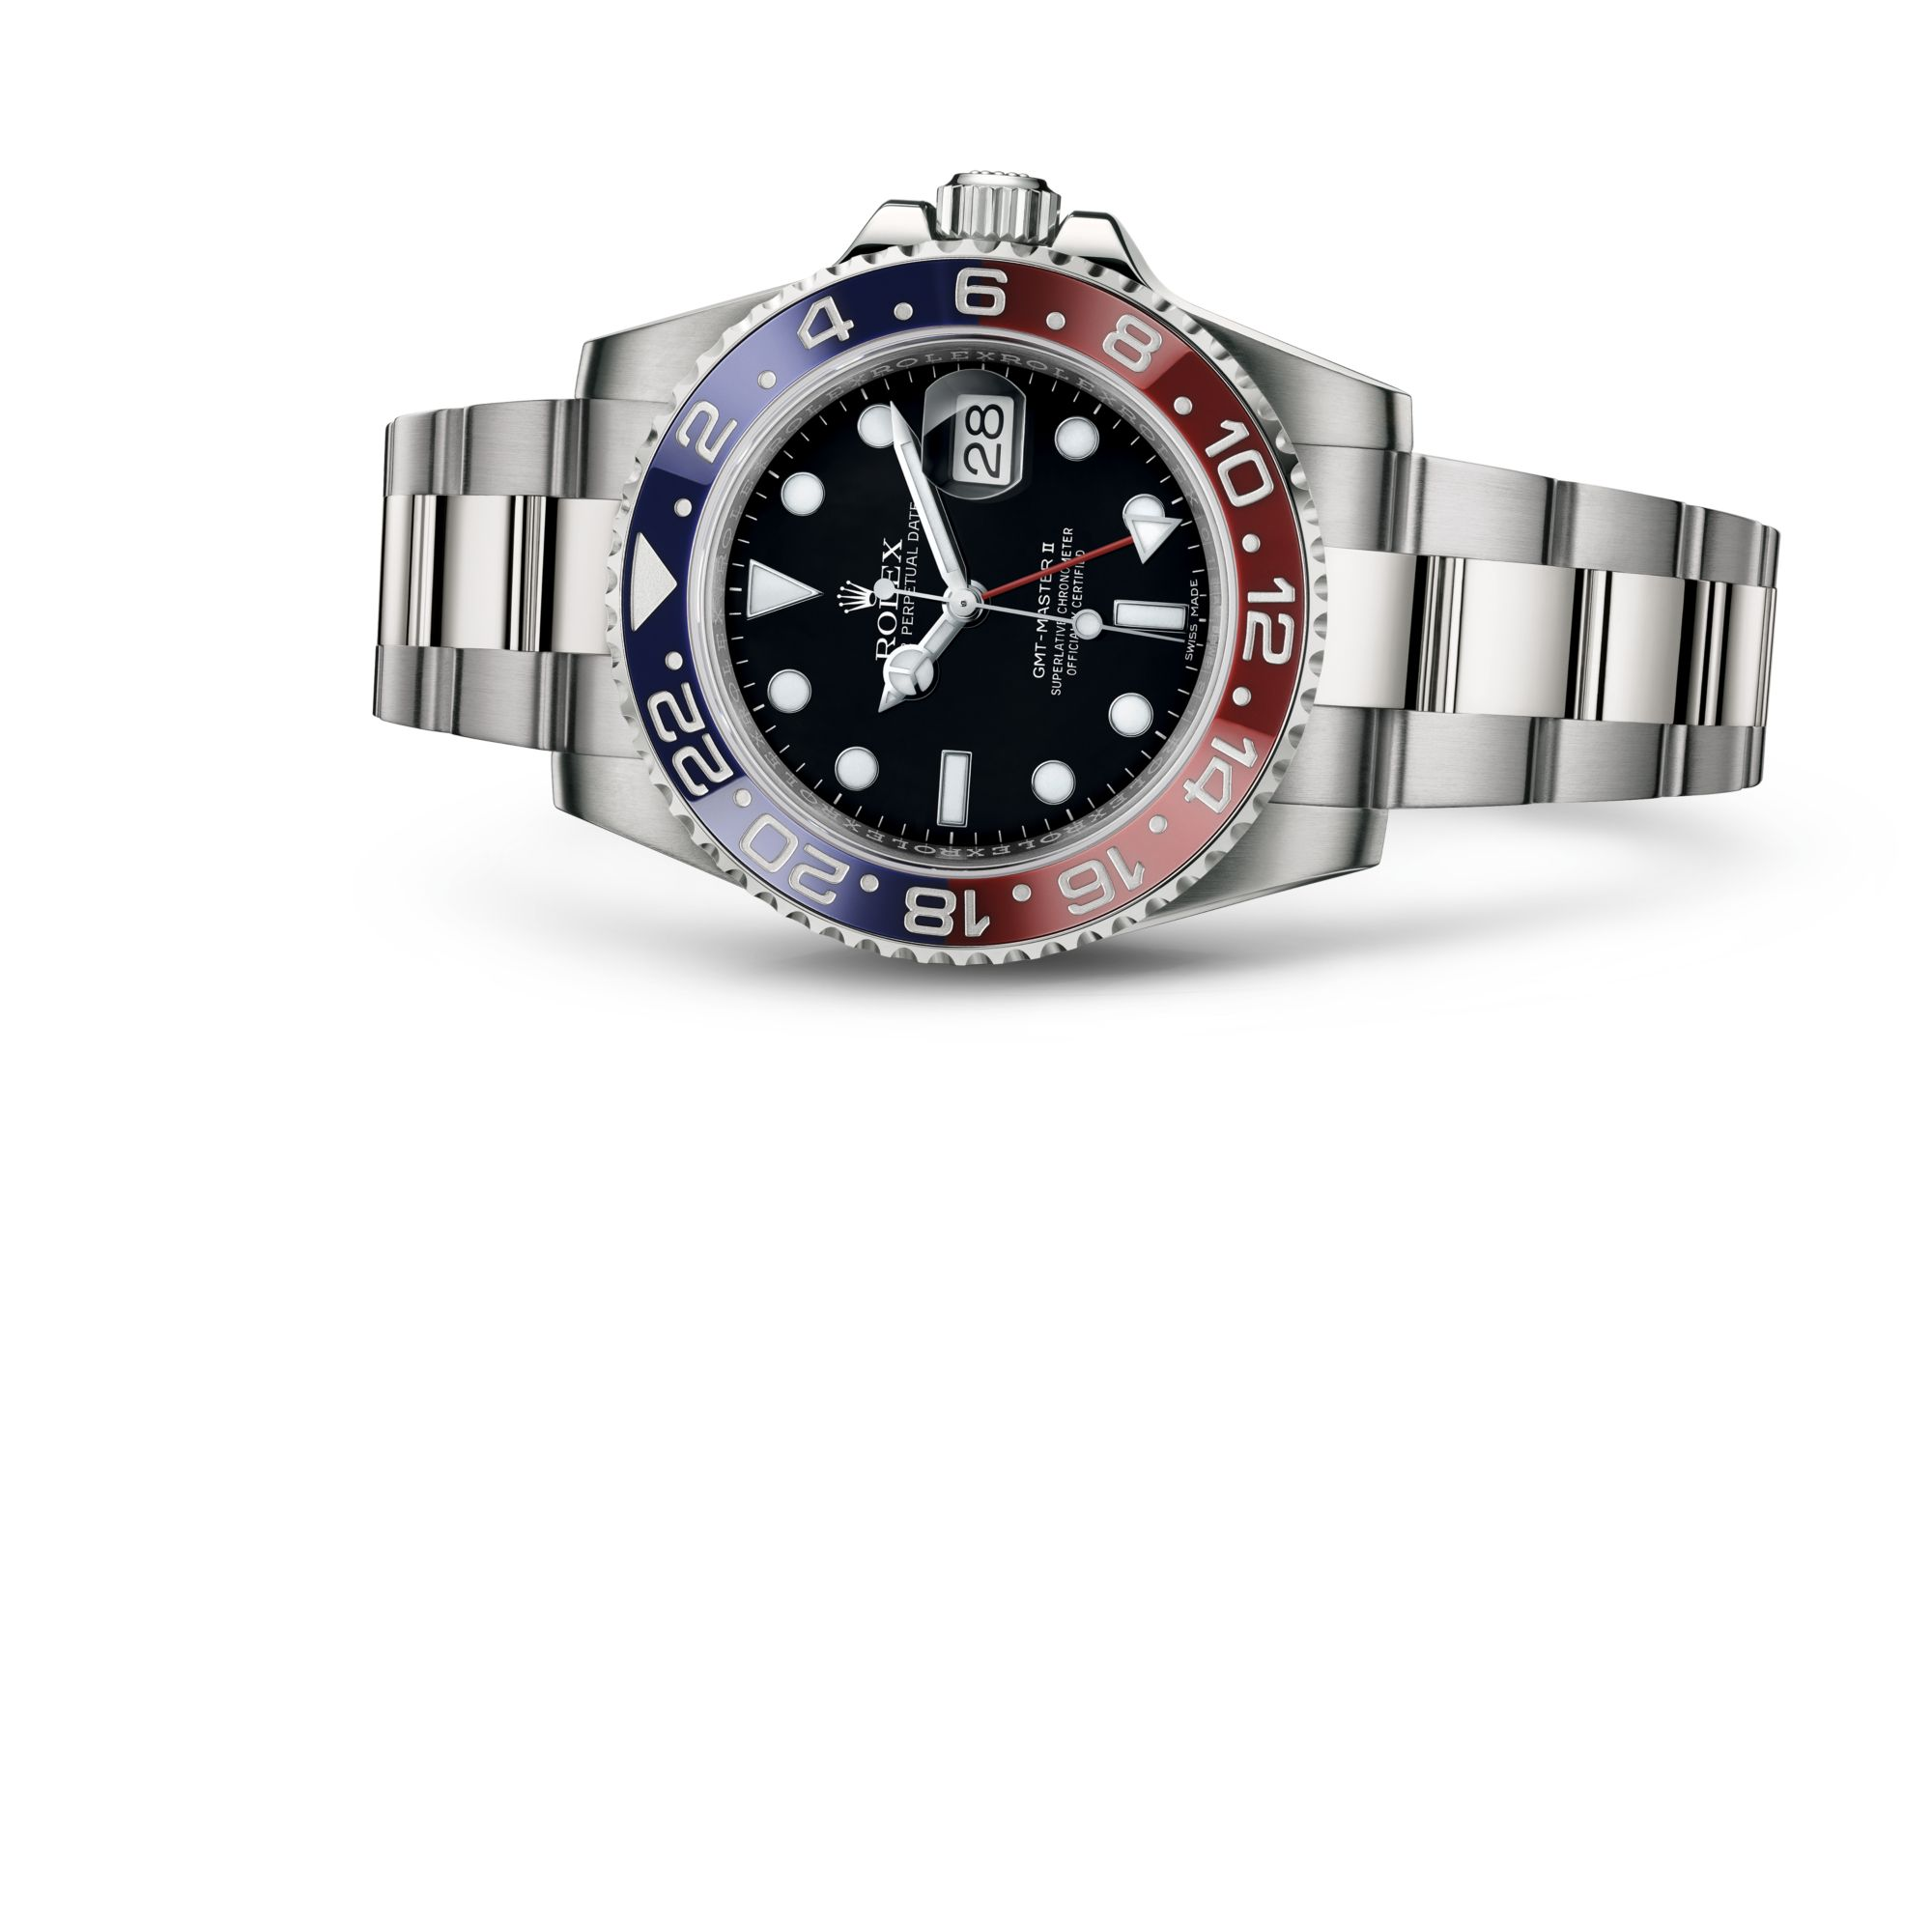 Rolex جي ام تي ماستر II M116719BLRO-0001